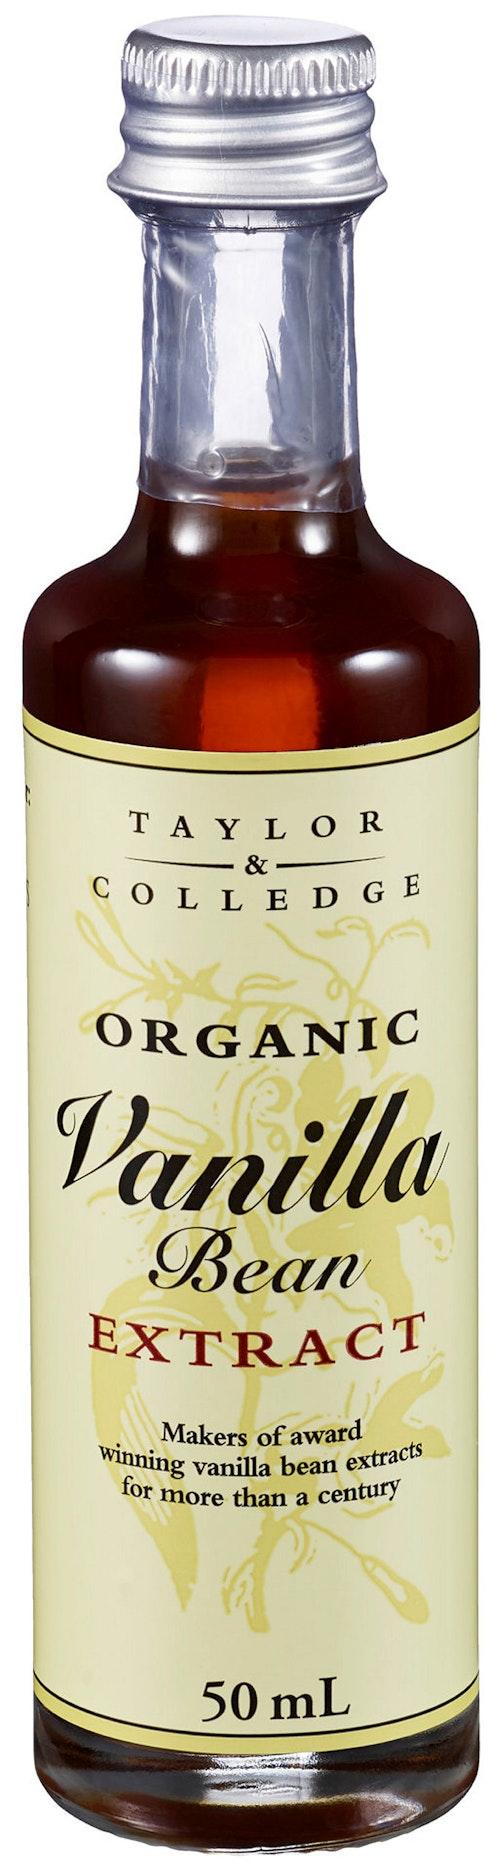 Dr. Oetker Vanilla Bean Extract 50 ml